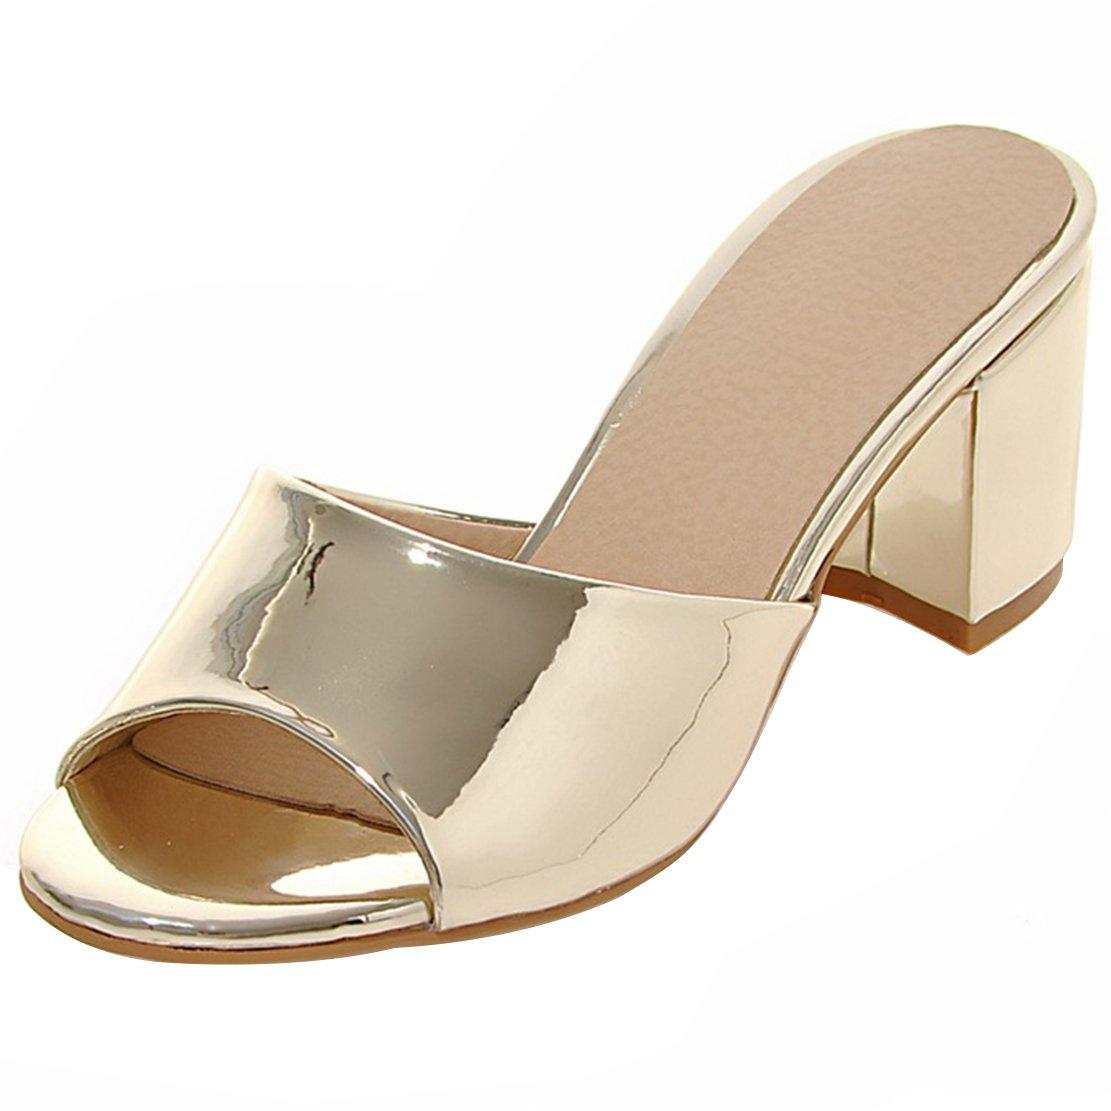 AIYOUMEI Damen Lack Pantoletten High Heels Mules Blockabsatz Sandaletten Slipper Damen Slip on Sandalen  38.5 EU|Gold